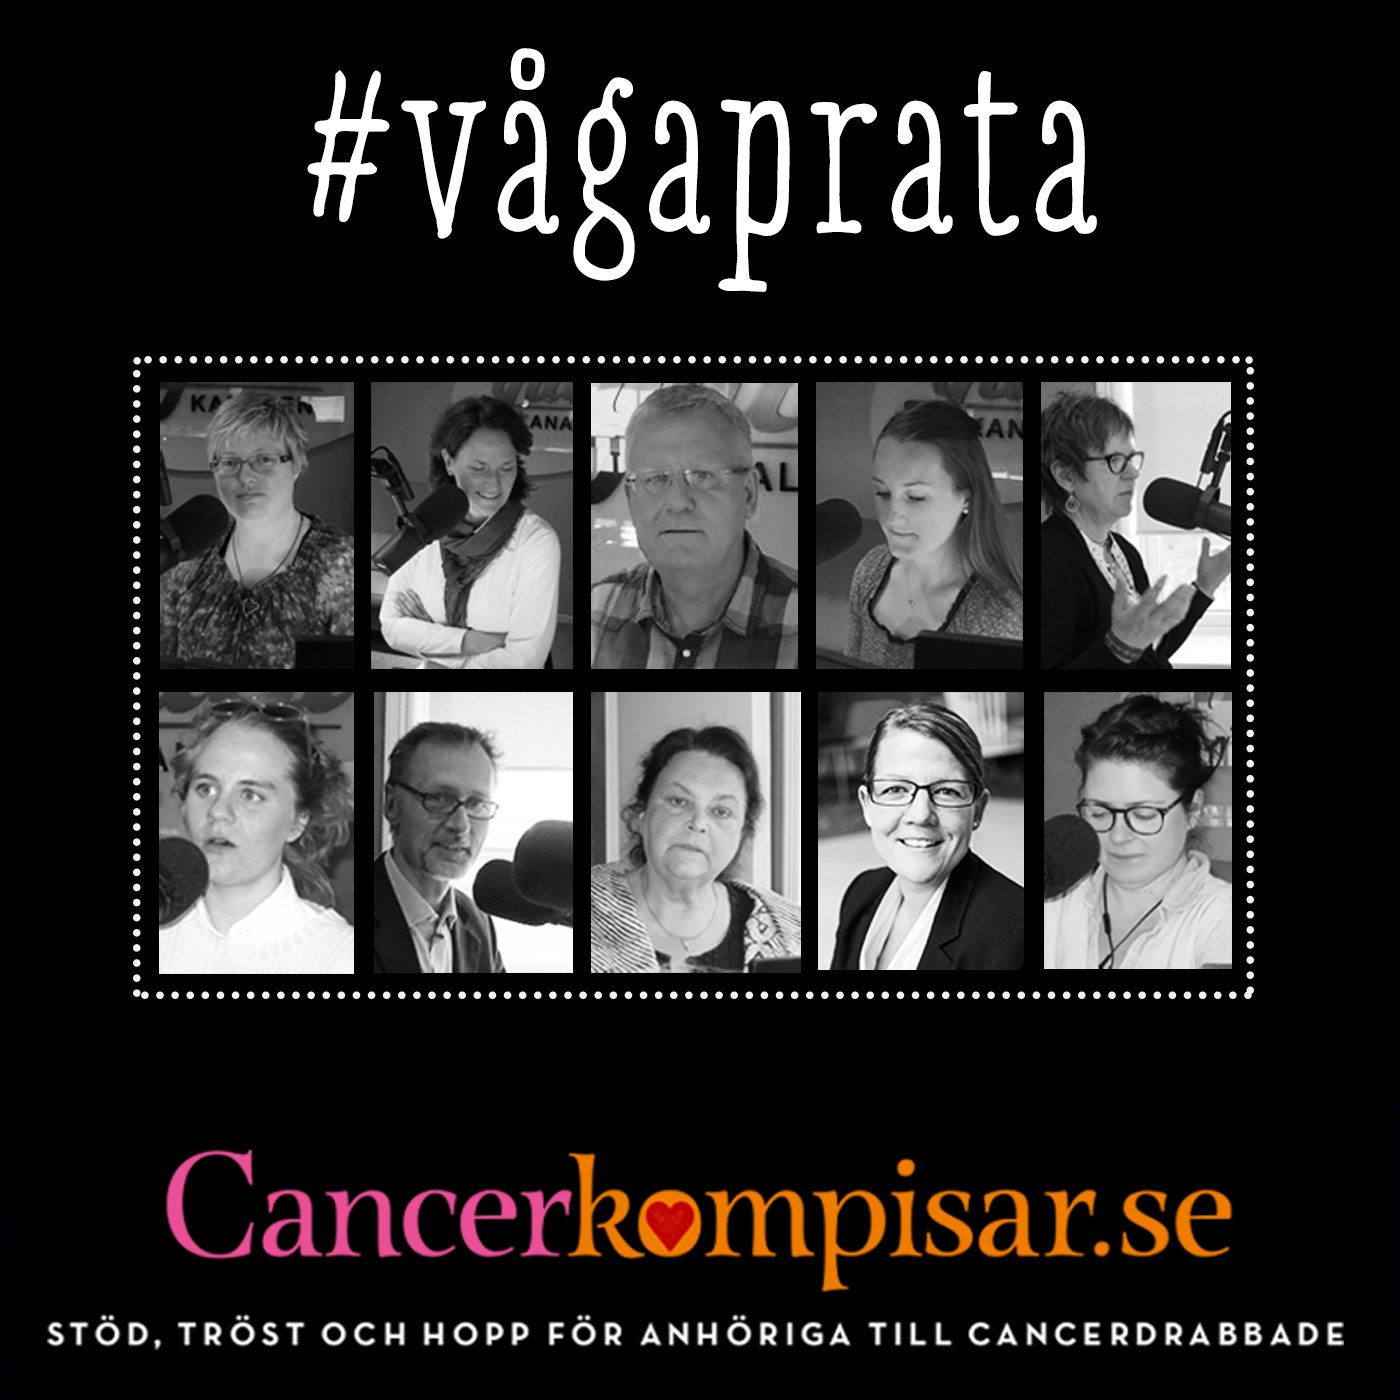 Vågaprata - Cancer ur 10 olika anhörigperspektiv